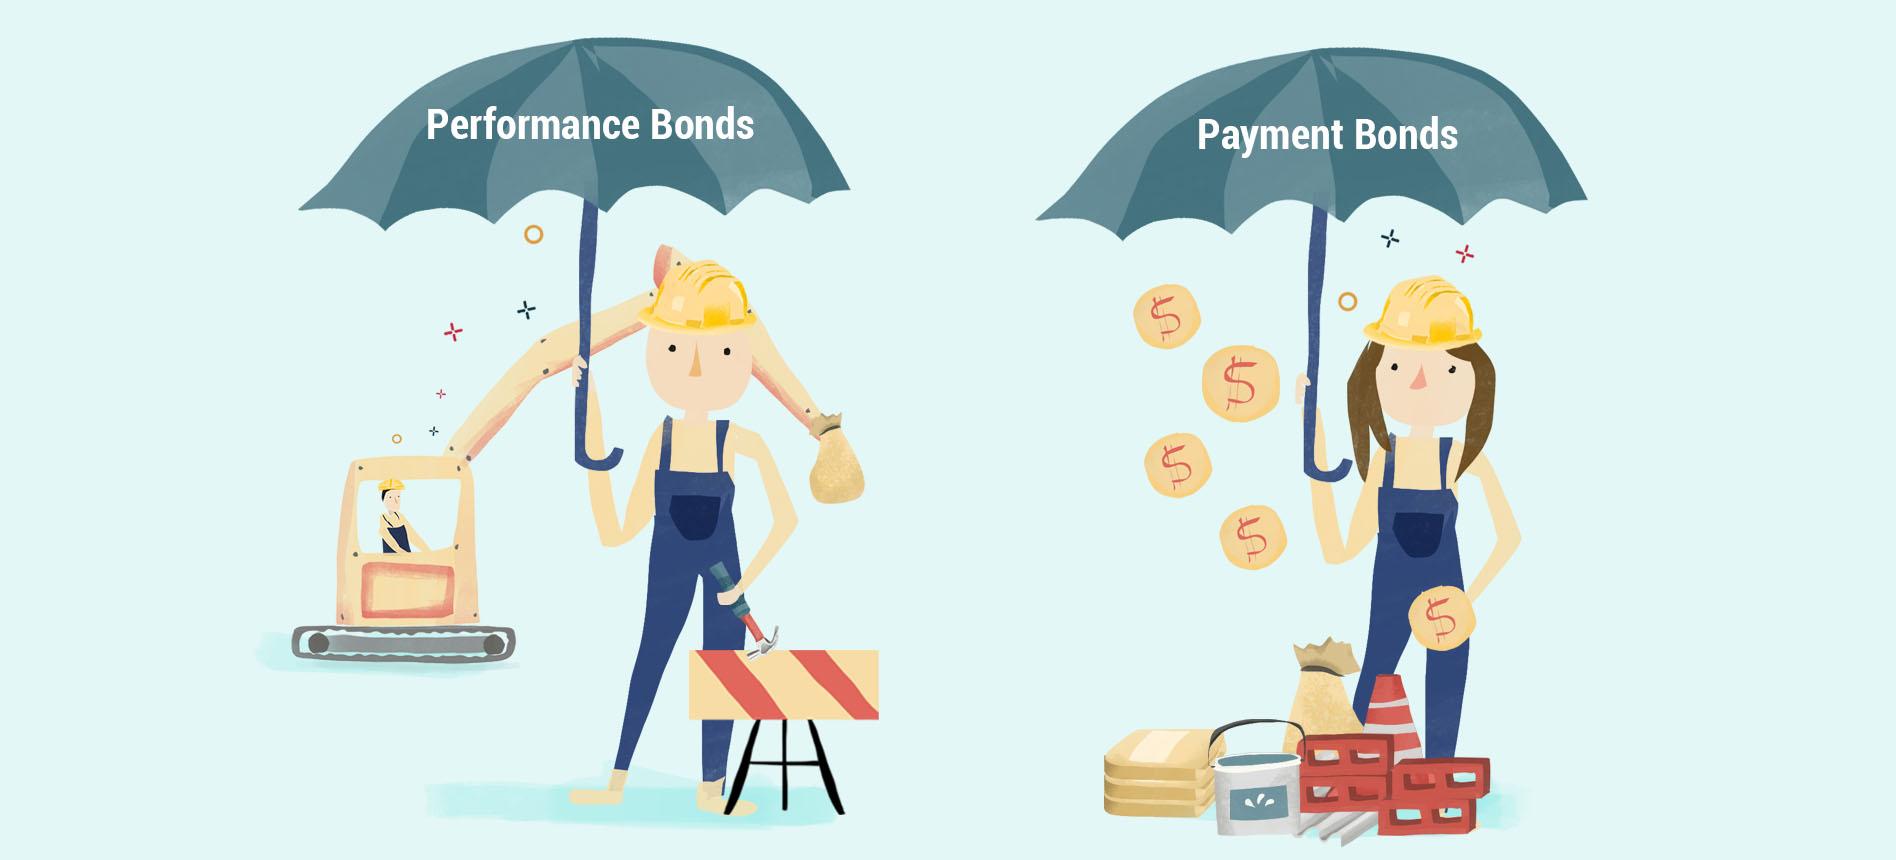 Payment Bonds and Performance Bonds